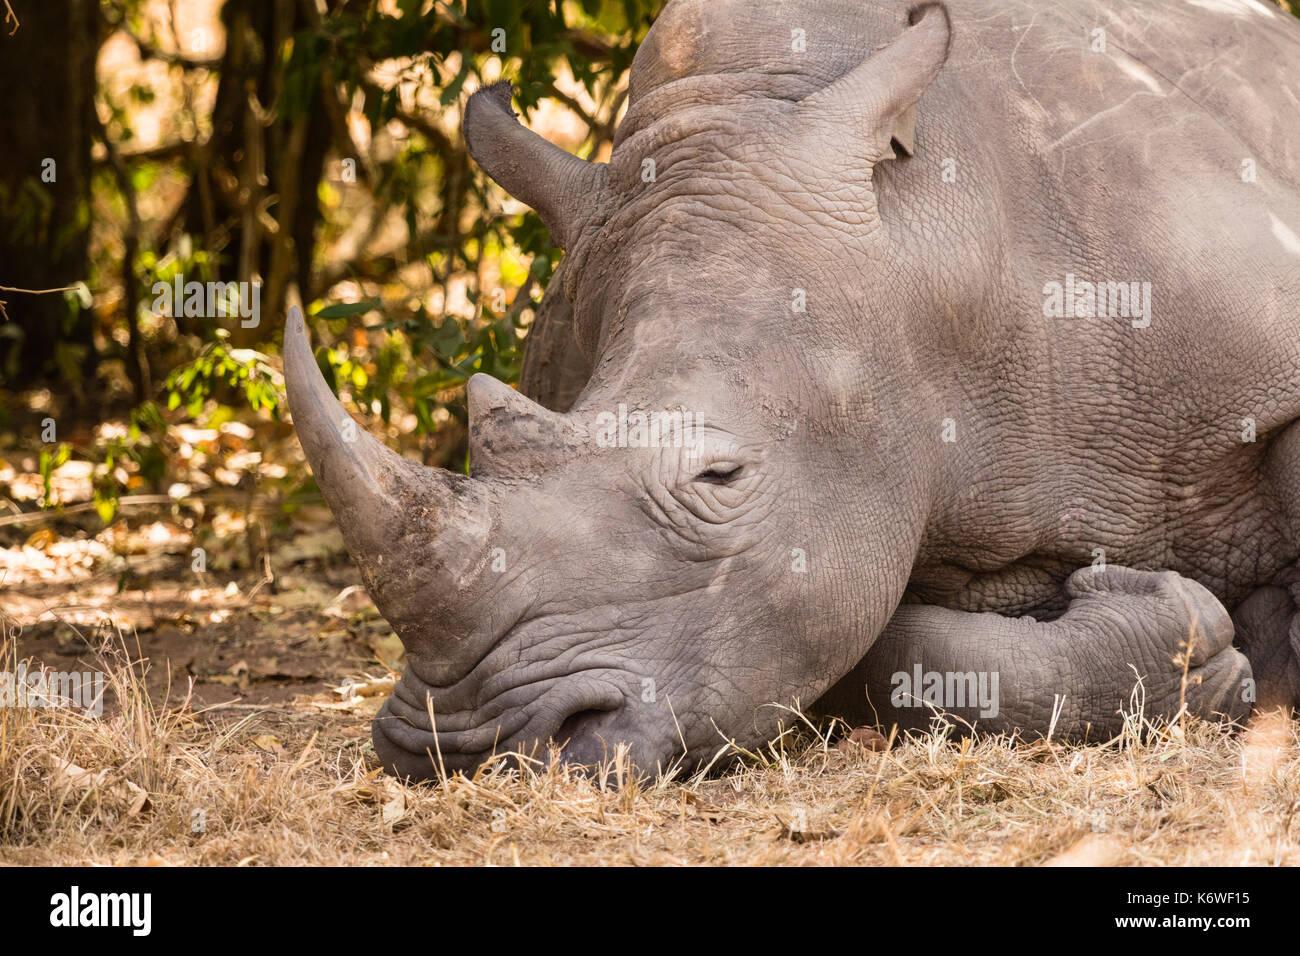 Northern White Rhinoceros Ceratotherium Simum Cottoni Sleeping Animal Portrait Ziwa Rhino